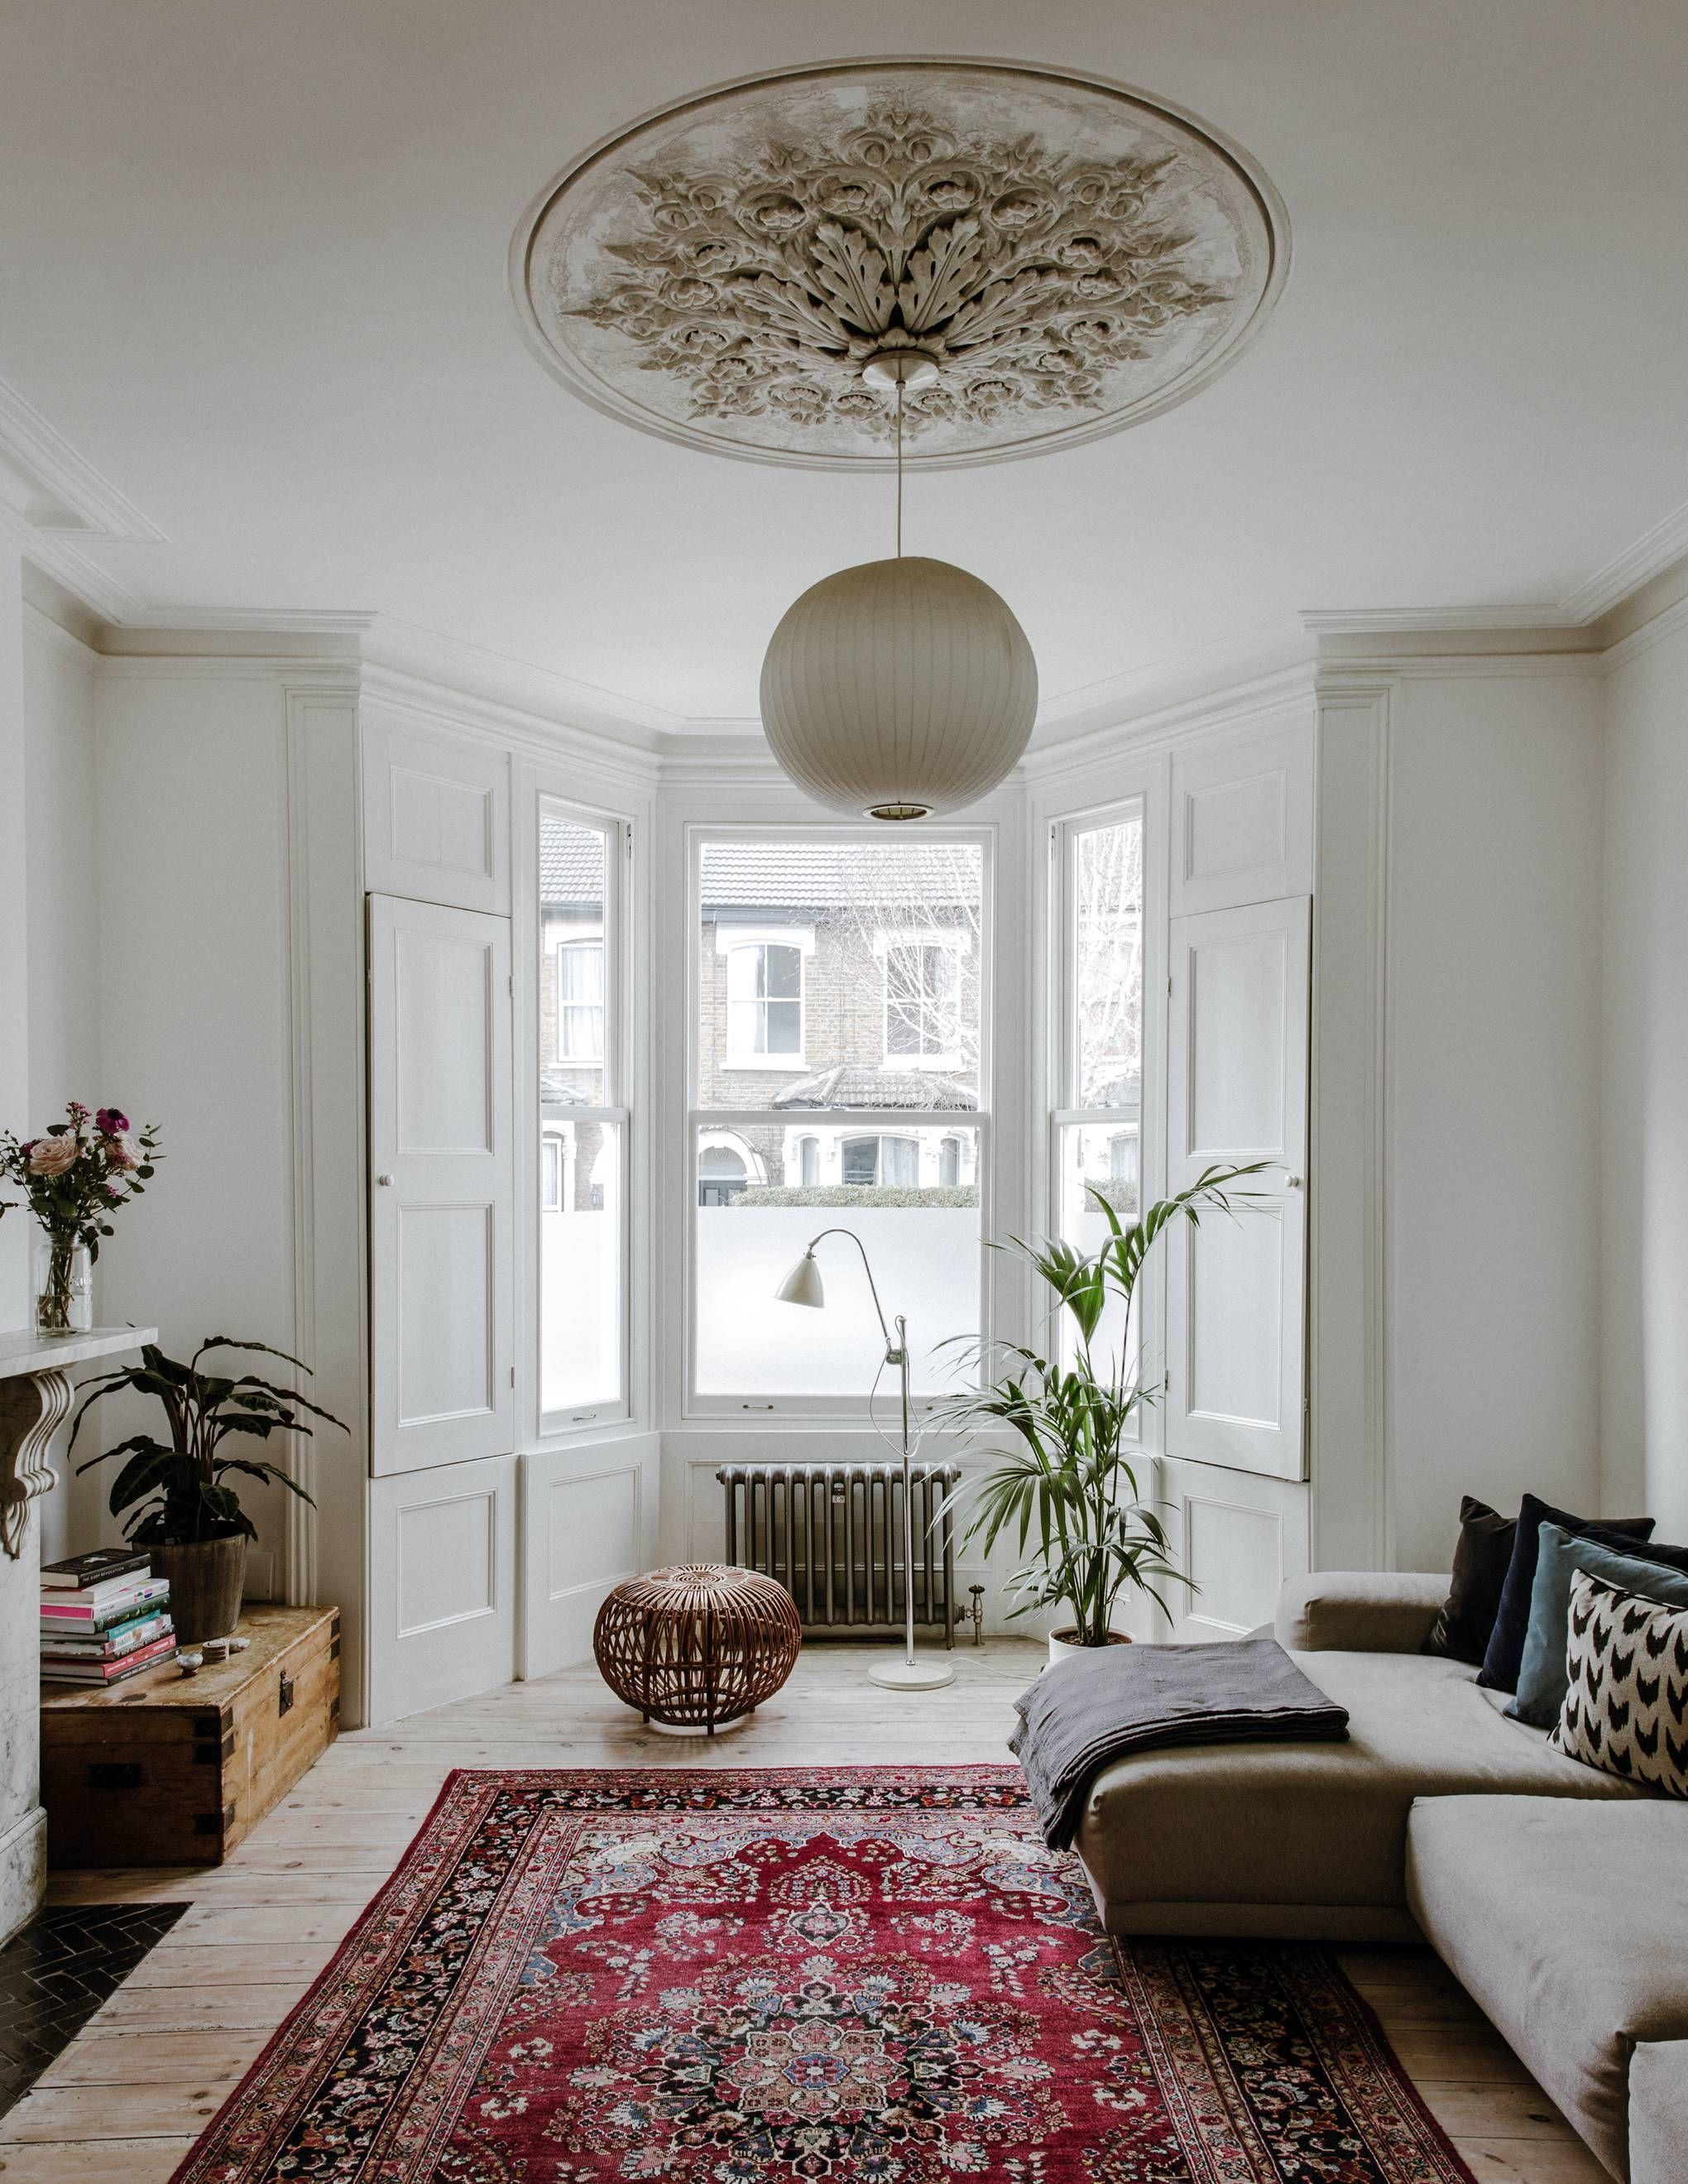 Photo of Frantic Living Room Windows #furnituremurah #HomeFurnitureWooden